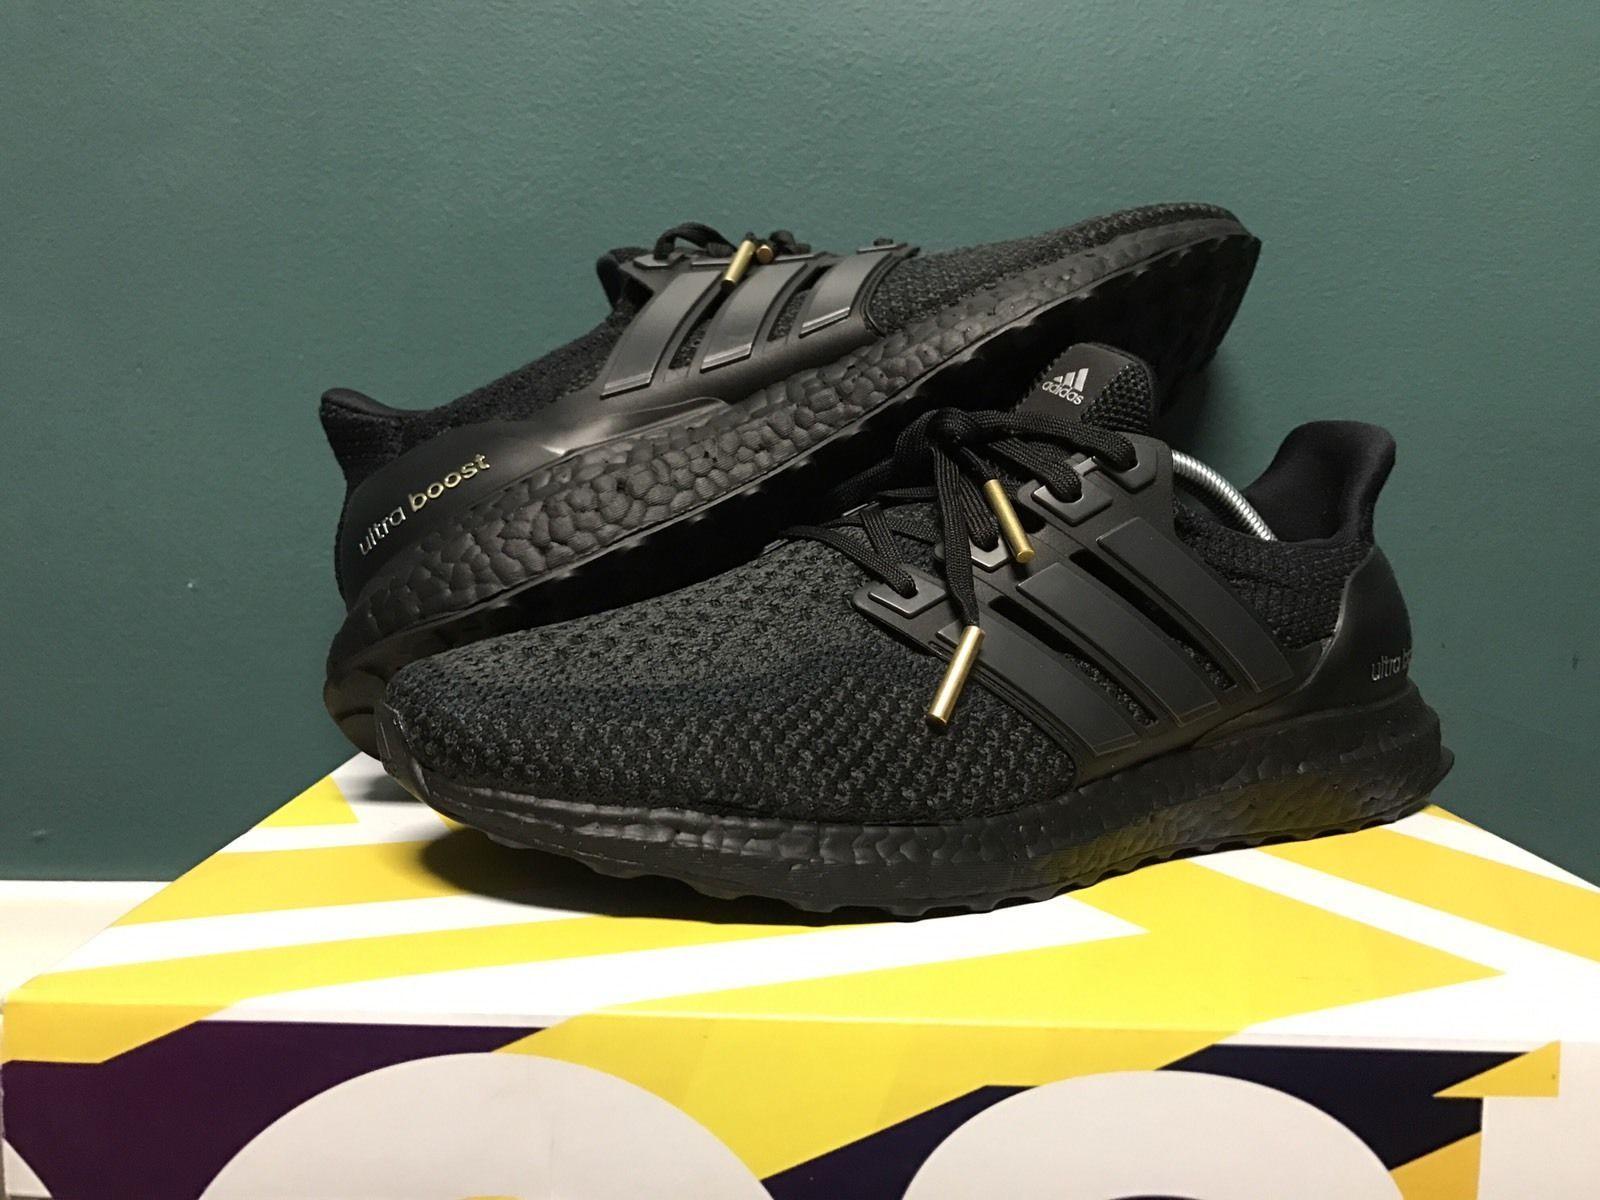 Adidas Ultra Boost Triple Black Size 10.5 Yeezy NMD